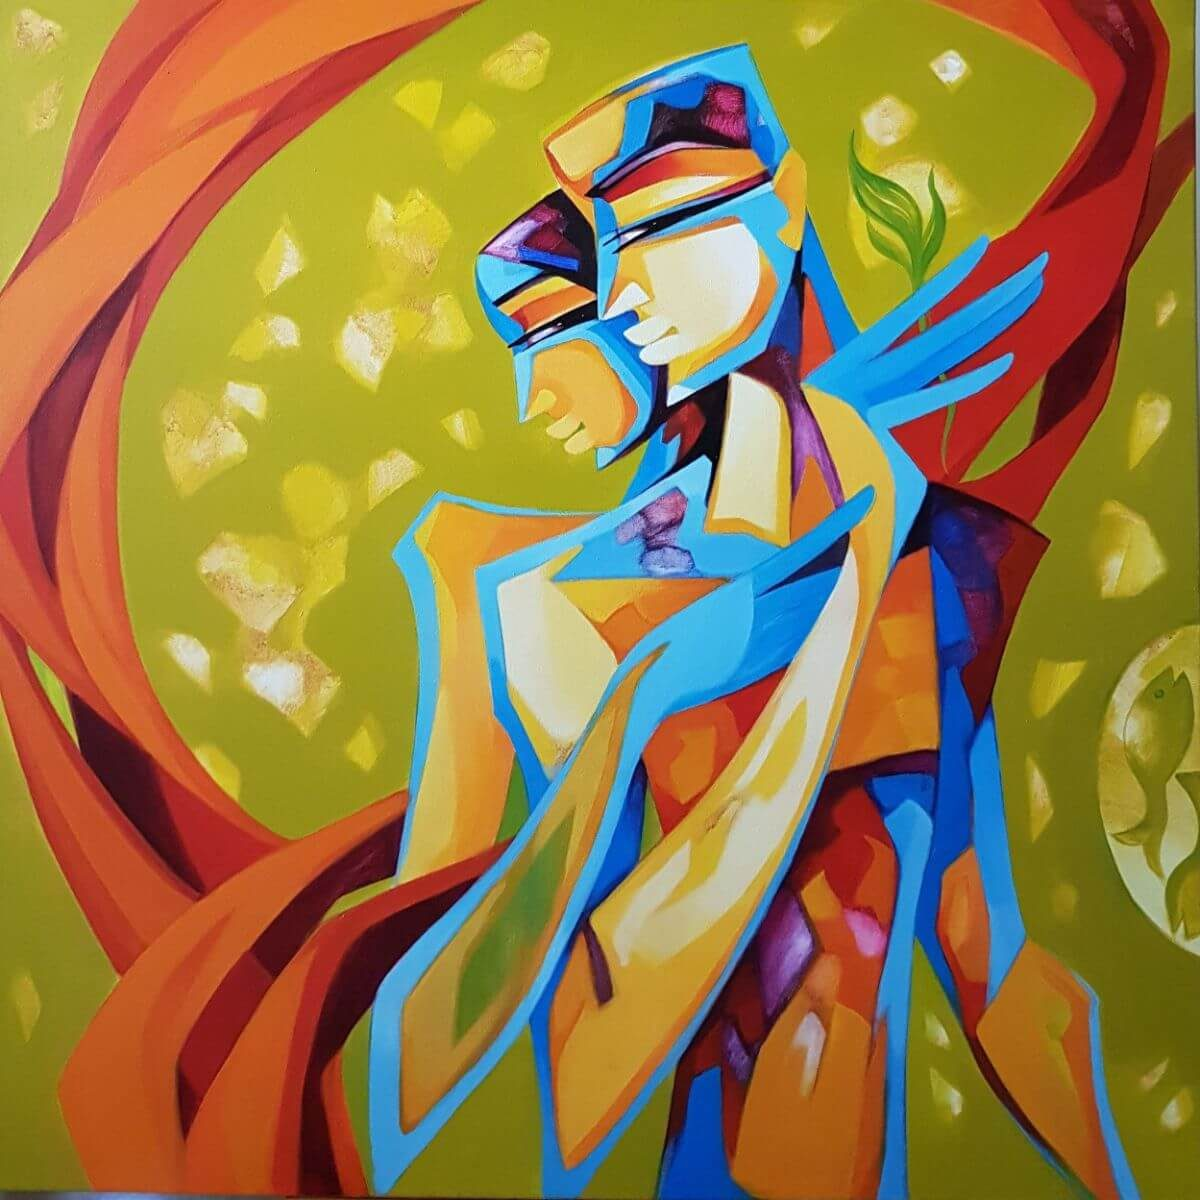 Enamored 2 | New wedding gift idea | Bridal Registry for Art